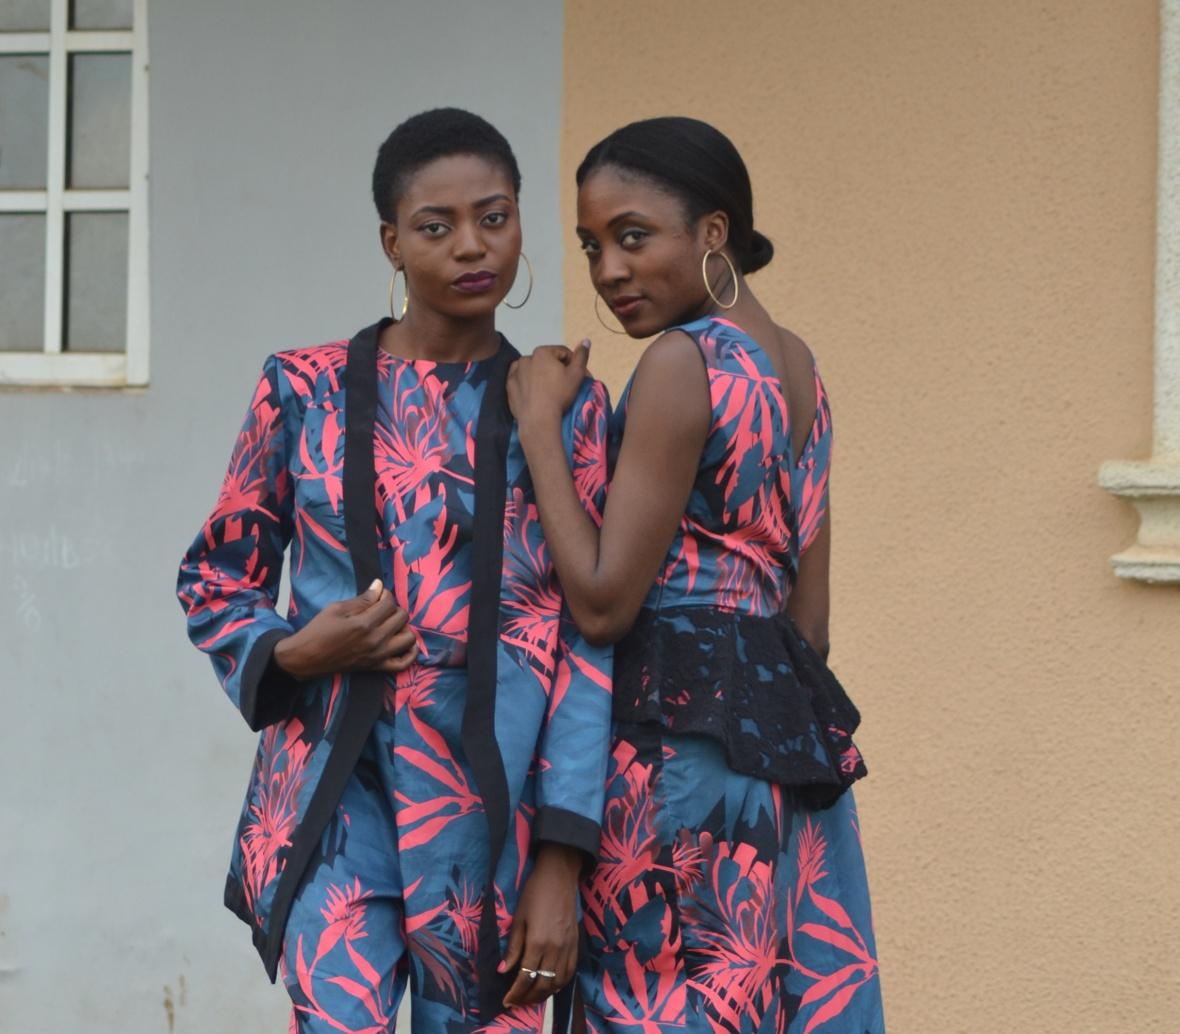 Peplum Blouse (TOYIN). Womenswear collection by Keji Victoria